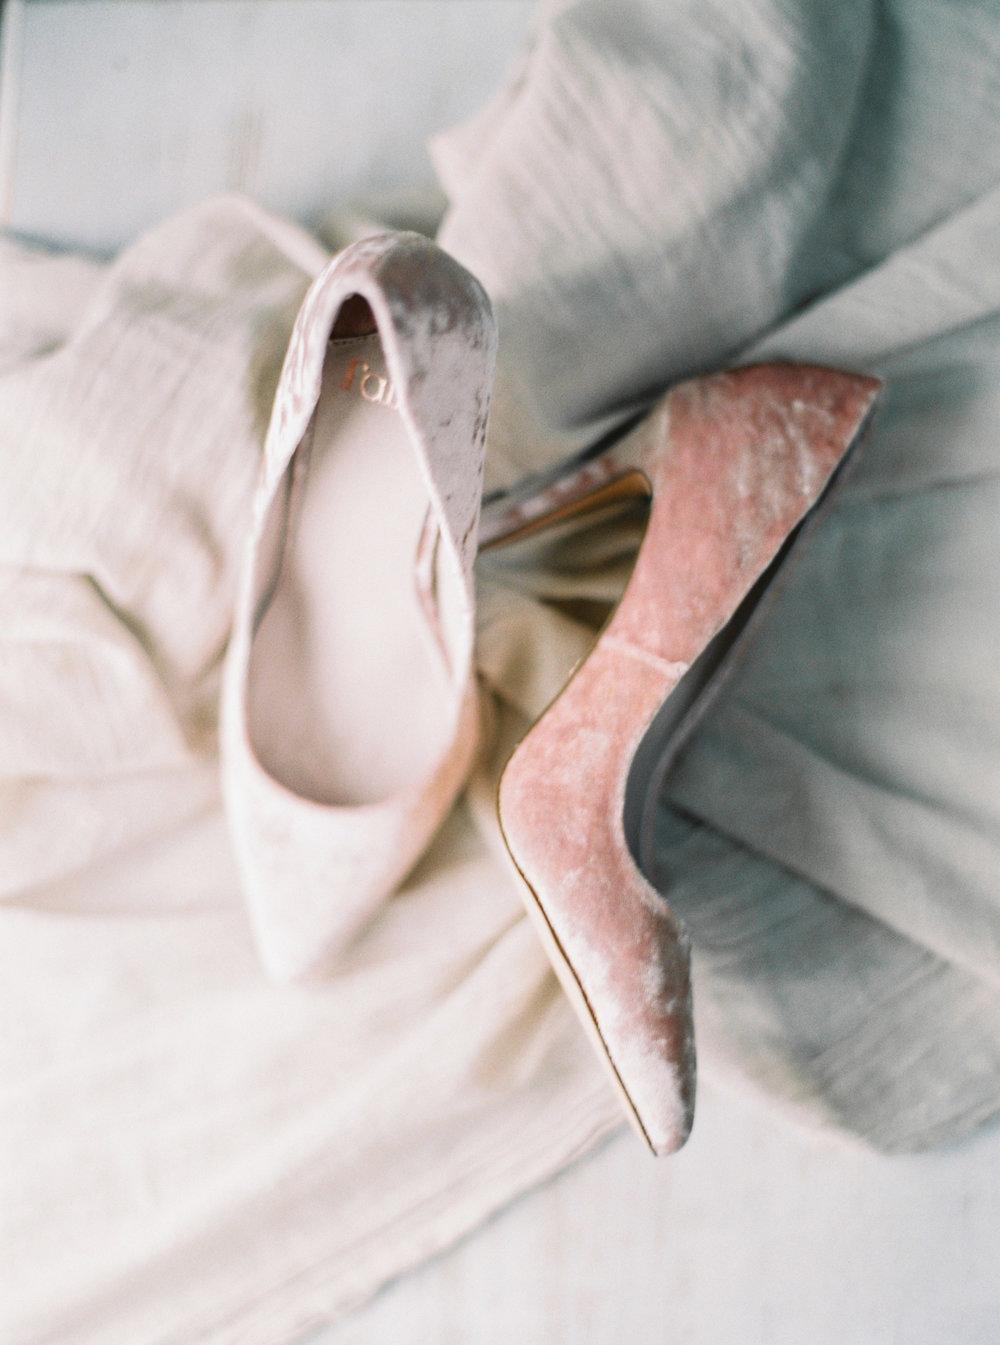 Luxury Wedding Planner UK | Our Chic & Romantic Engagement Shoot in Bath | Katie Julia Photography - 95.JPG